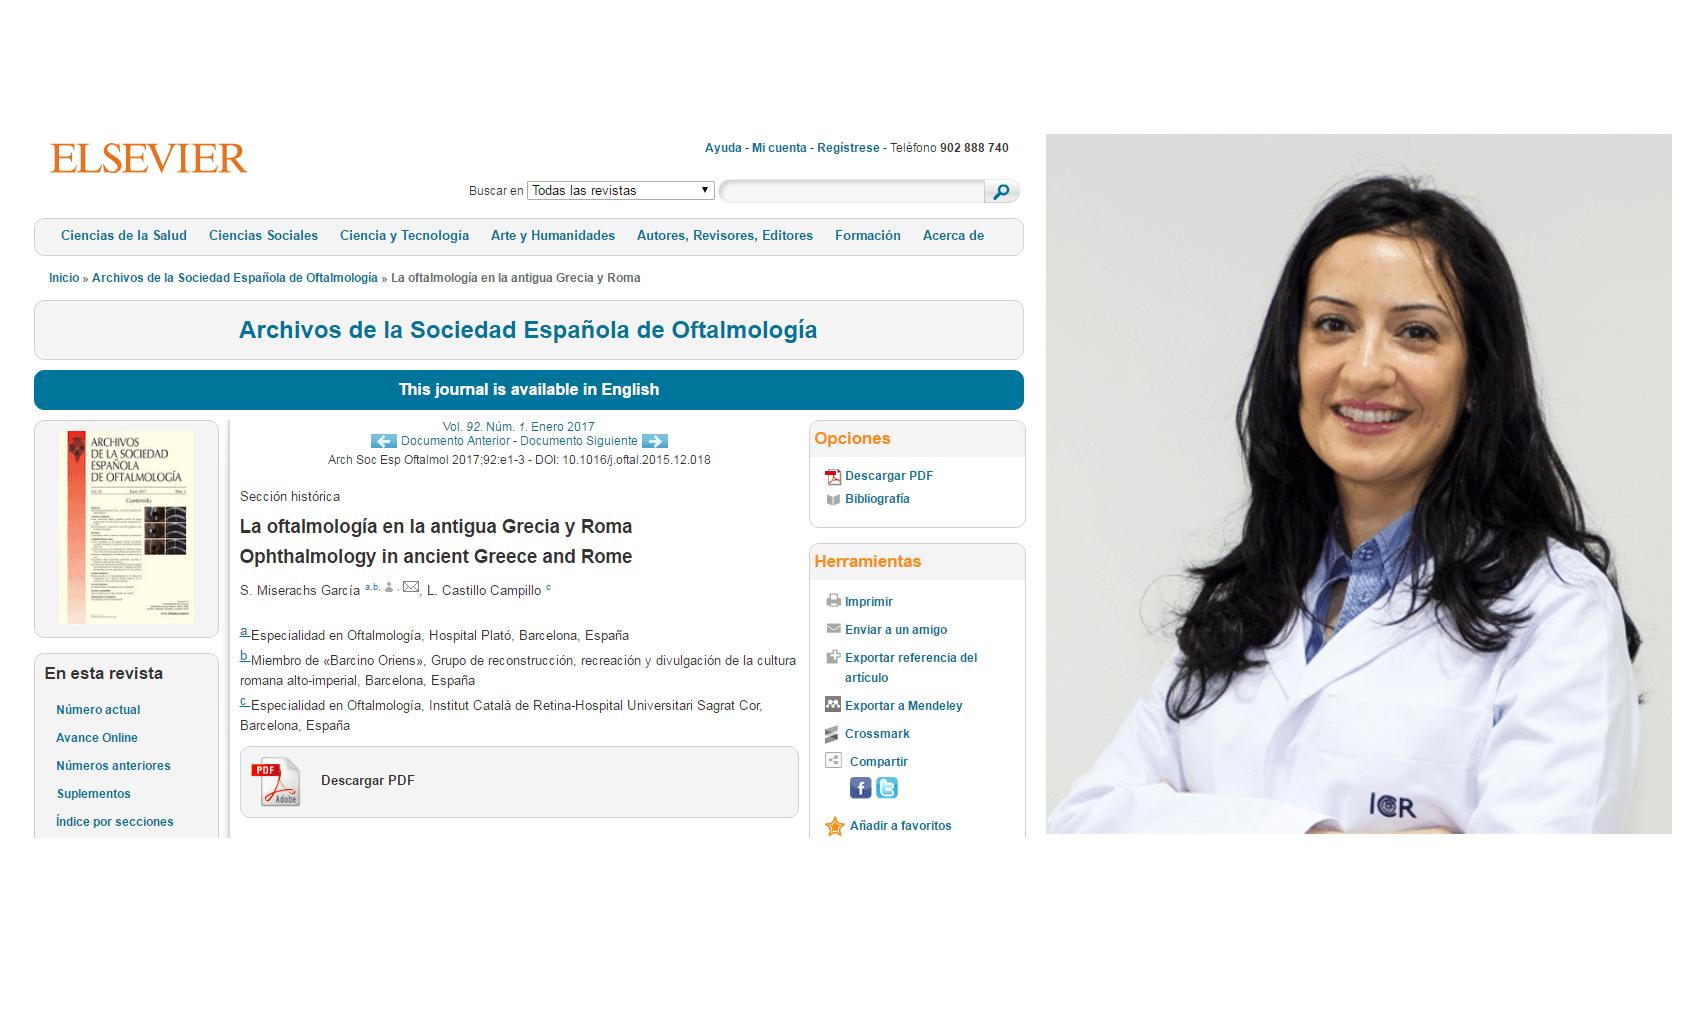 La Dr. Castillo, co-auteure d'un article publié au journal Archivos de la Sociedad Española de Oftalmología